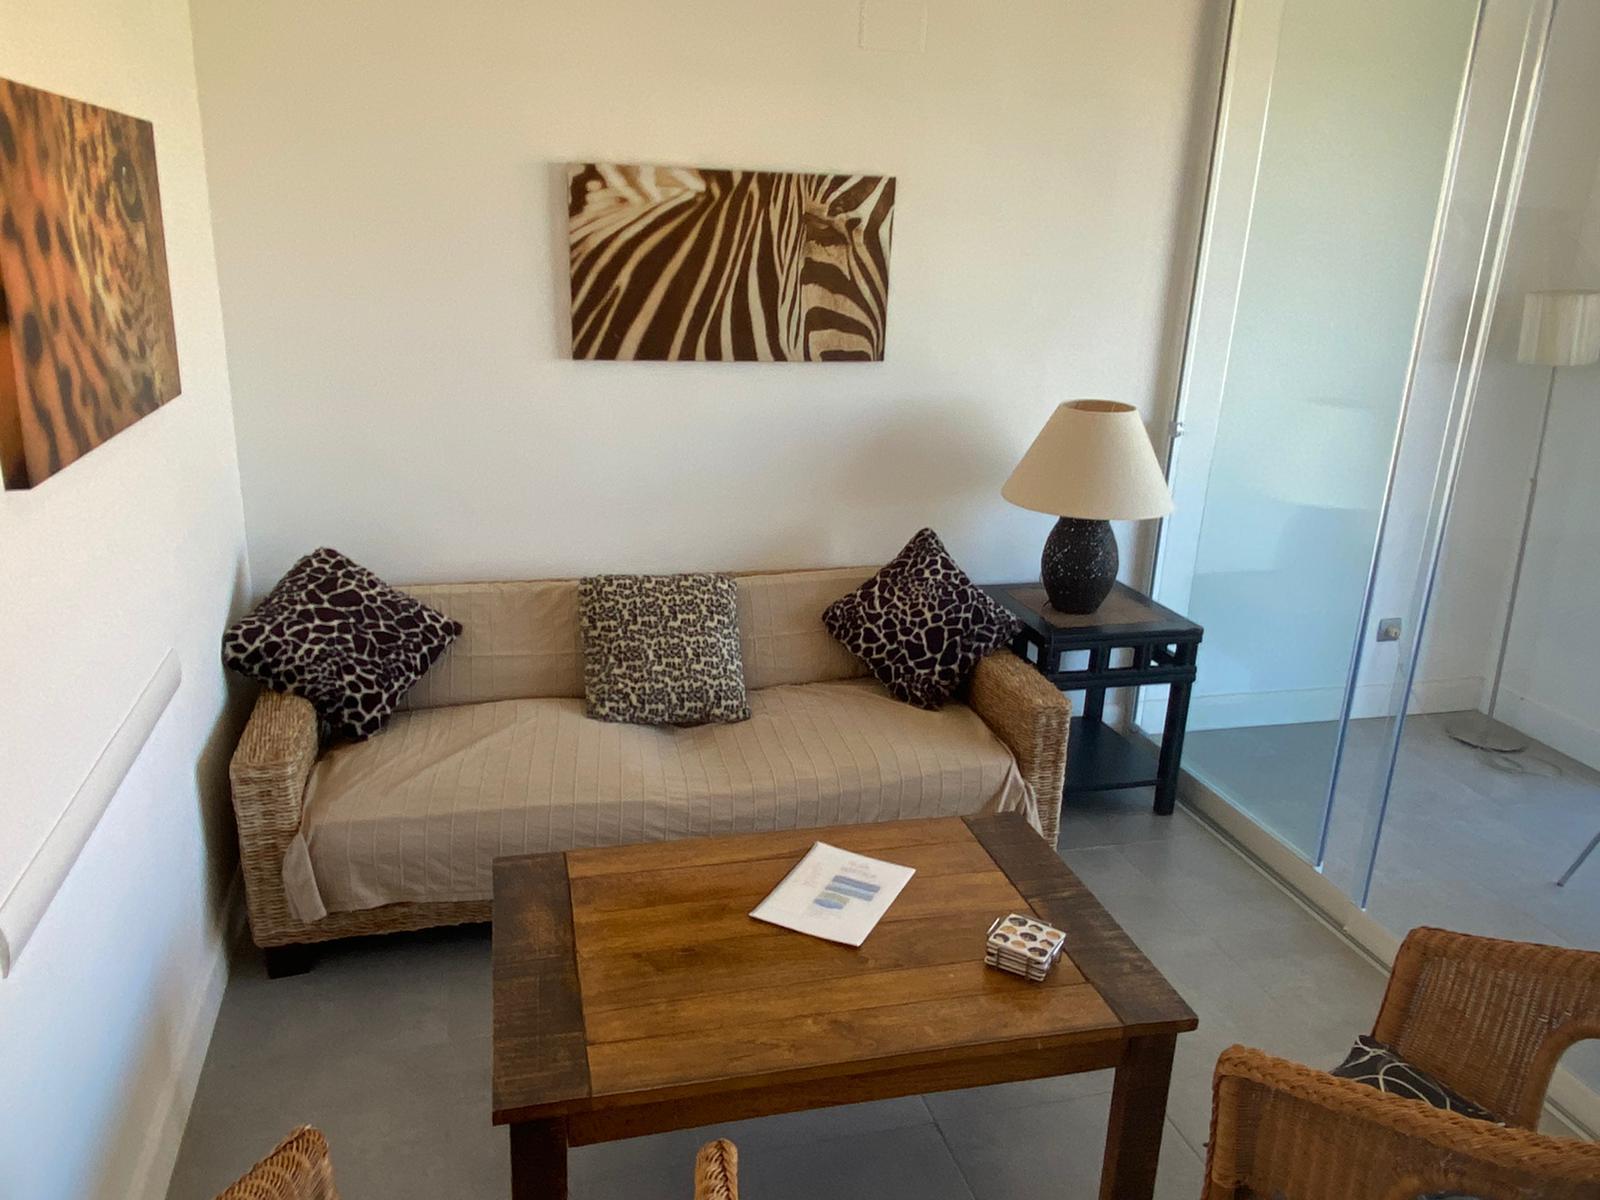 Imagen 10 del Apartamento en El Espigón, 1ª Planta nº4 Poniente (3d+2b), Punta del Moral (HUELVA), Paseo de la Cruz nº22